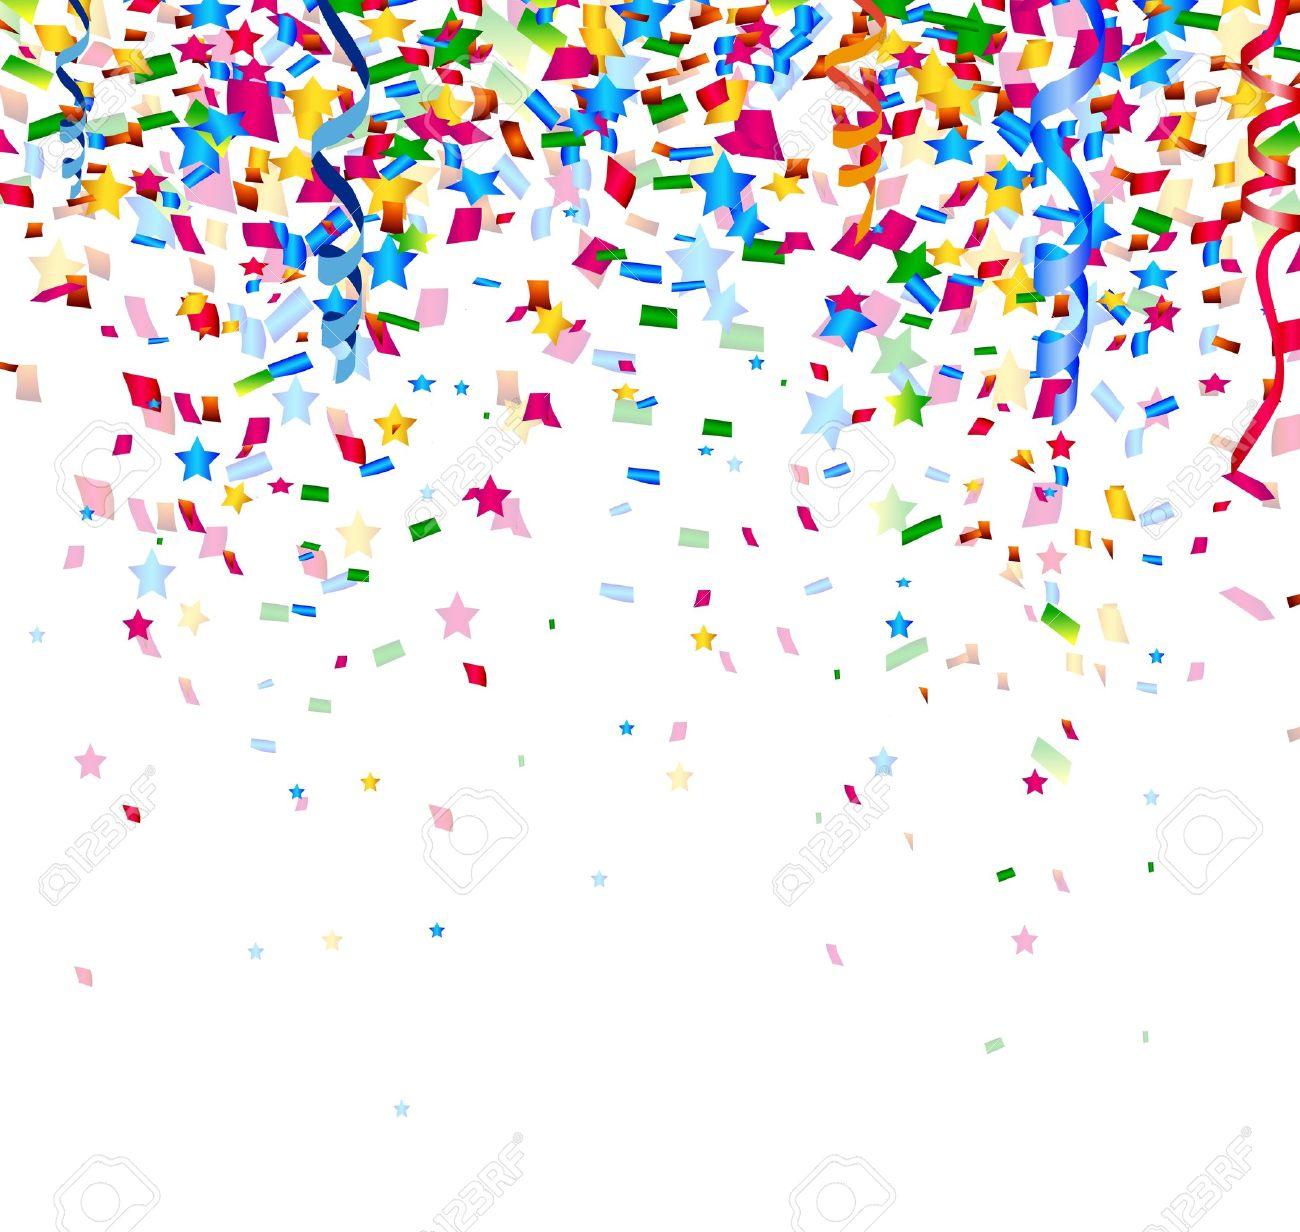 colorful confetti on white background - 38408519